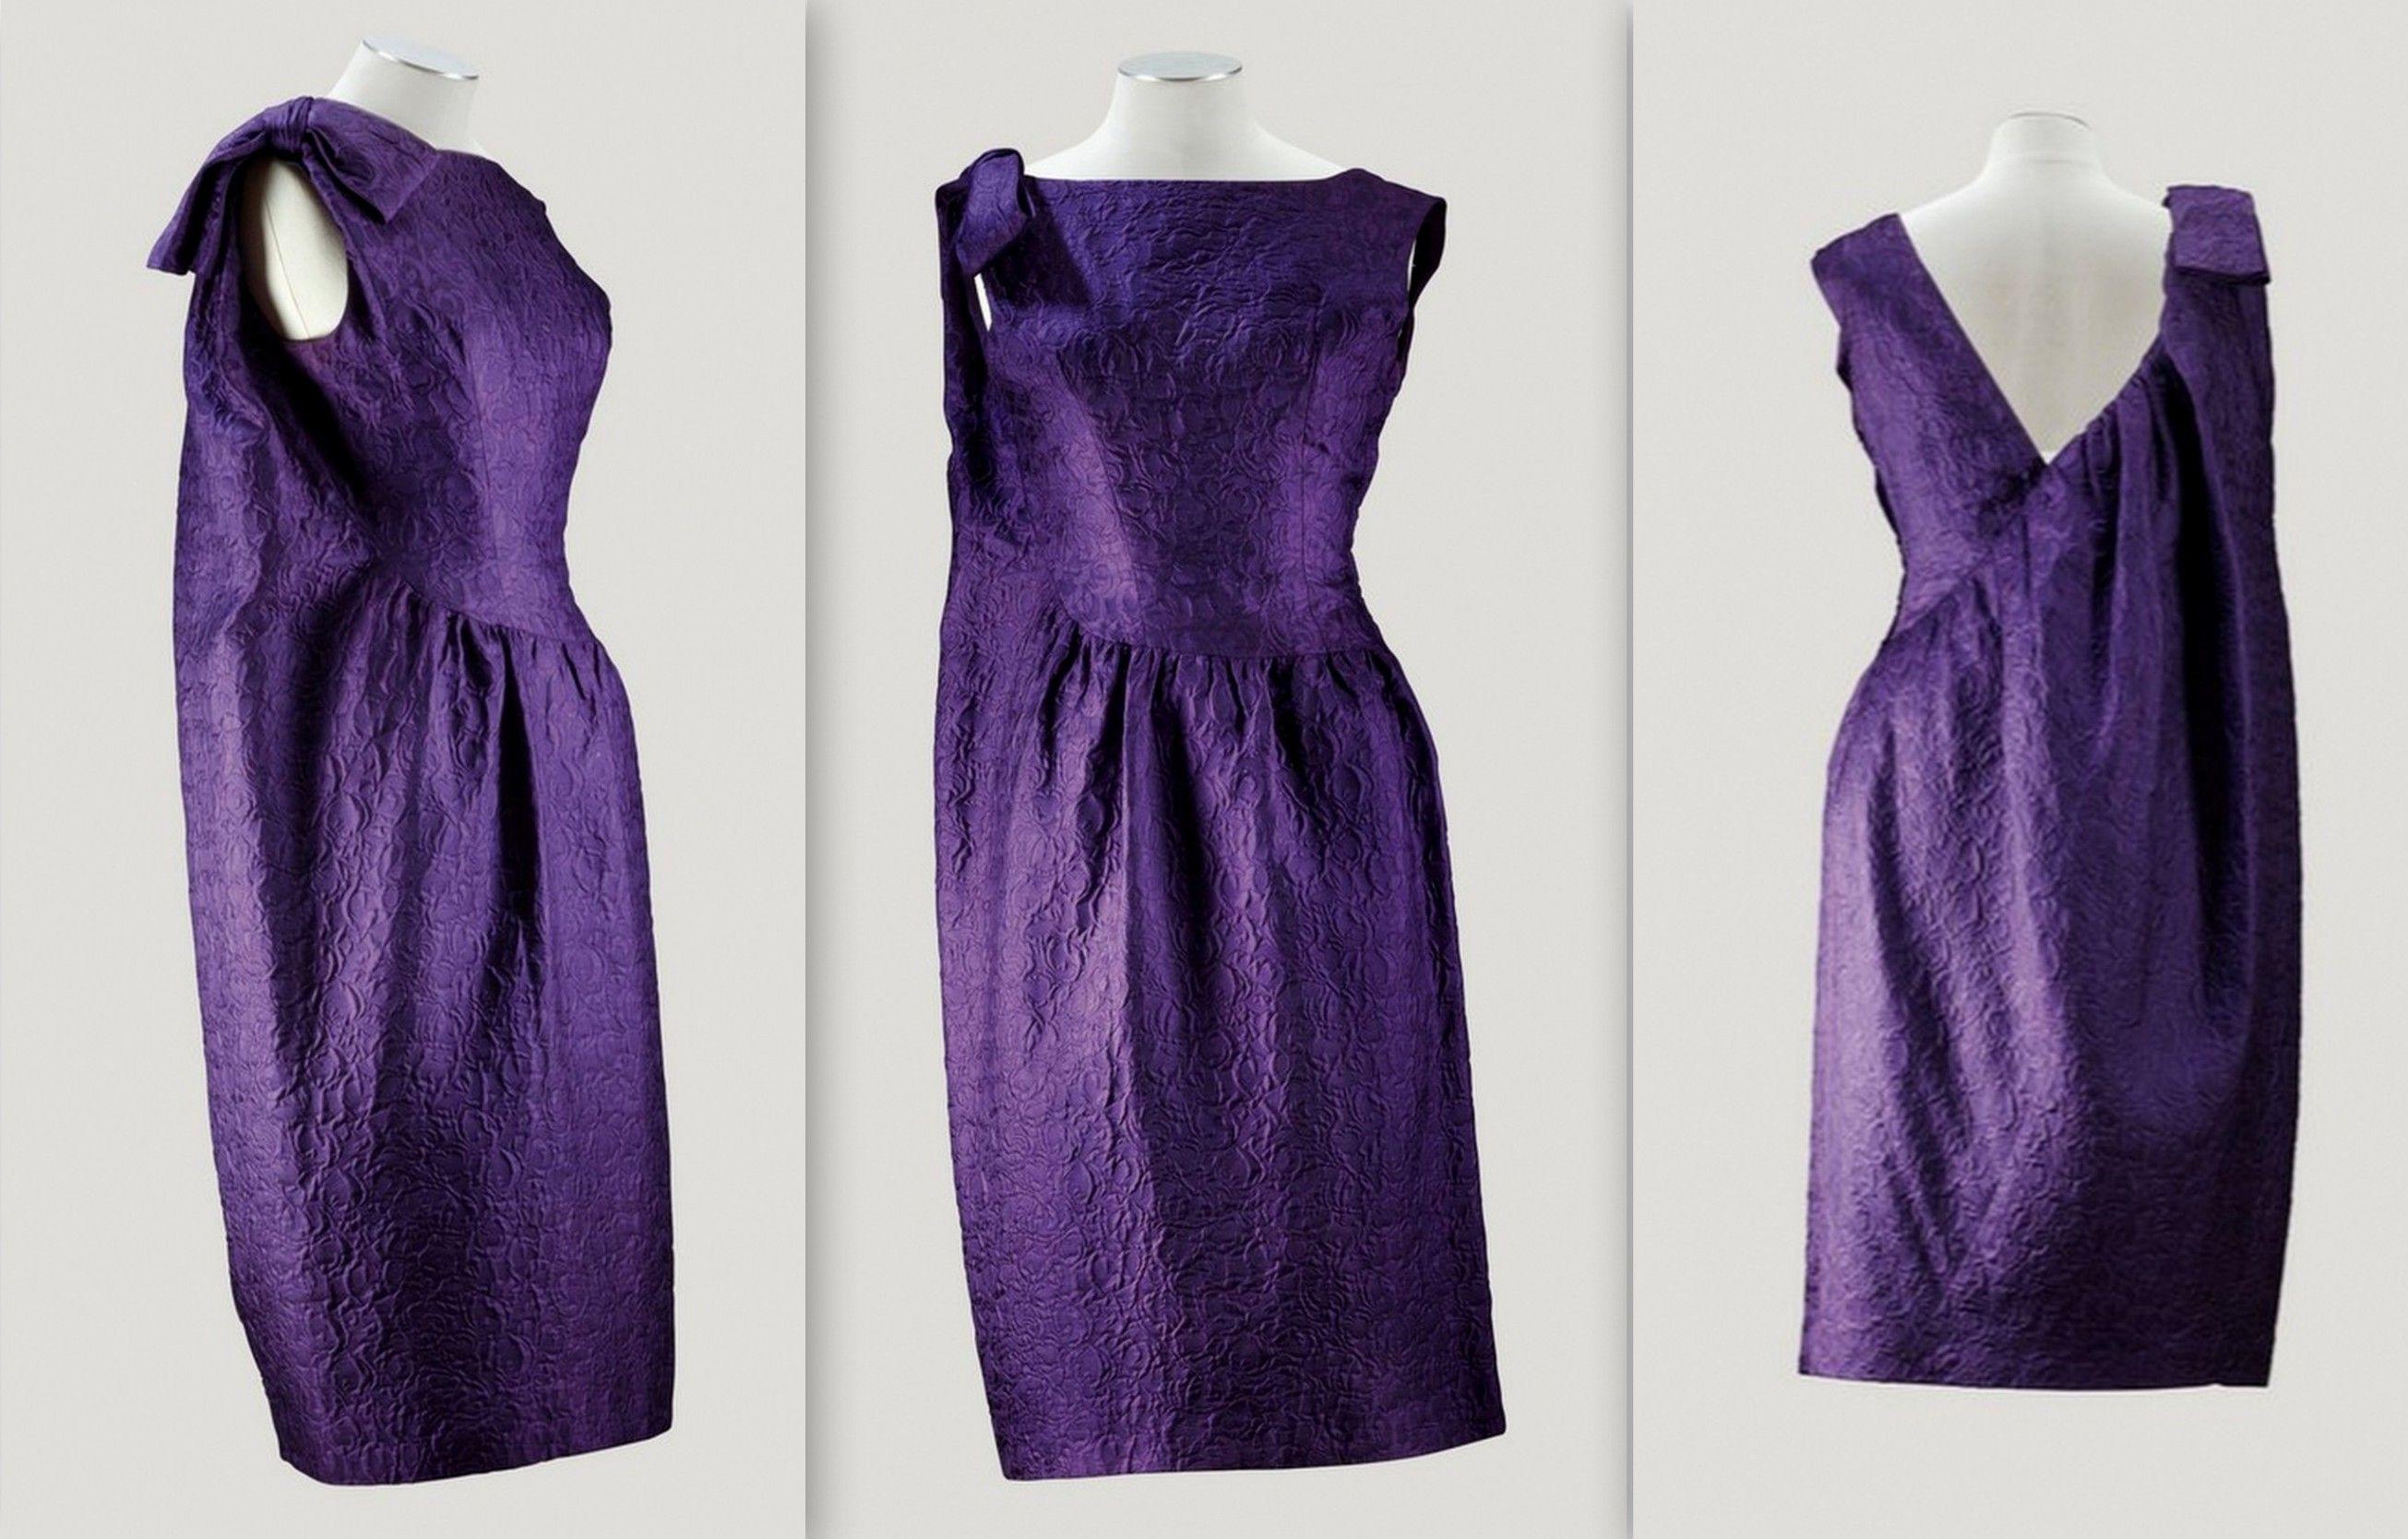 1962 Balenciaga Haute Couture, A PURPLE CLOQUÉ SILK COCKTAIL DRESS ...